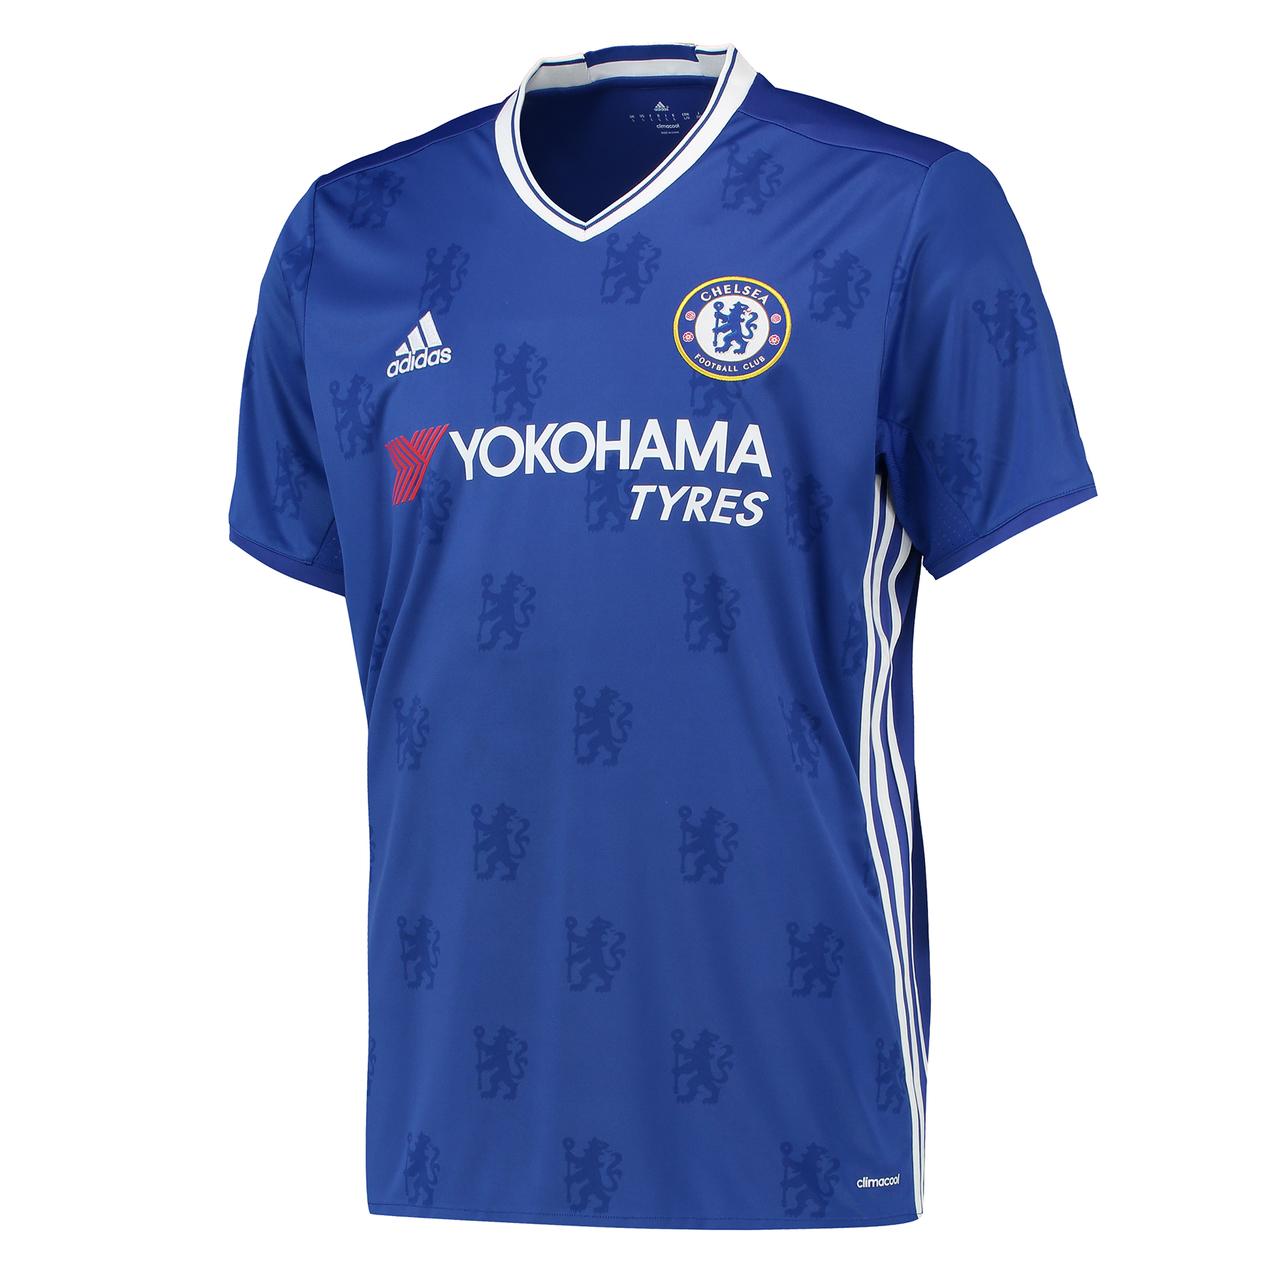 Chelsea 16/17 Adidas Home Kit   16/17 Kits   Football ...